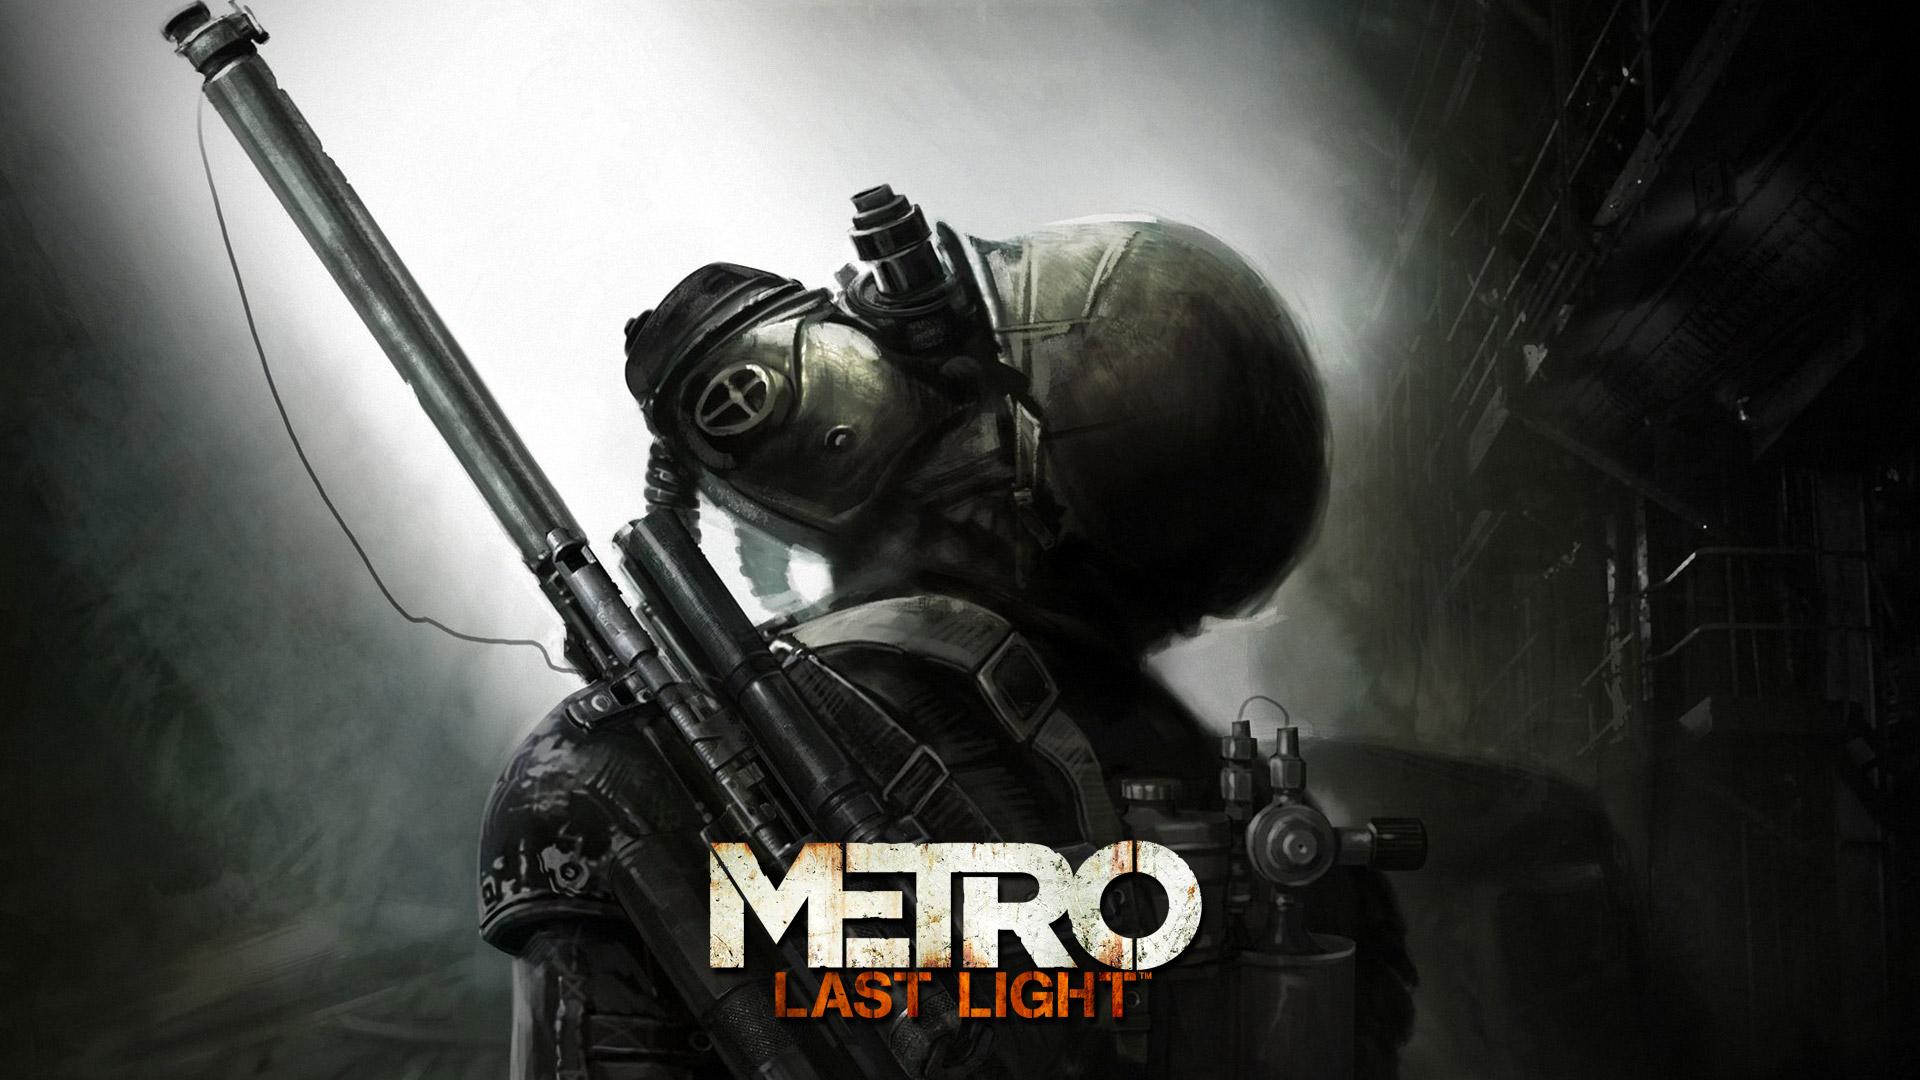 Metro: Last Light Wallpaper in 1920x1080